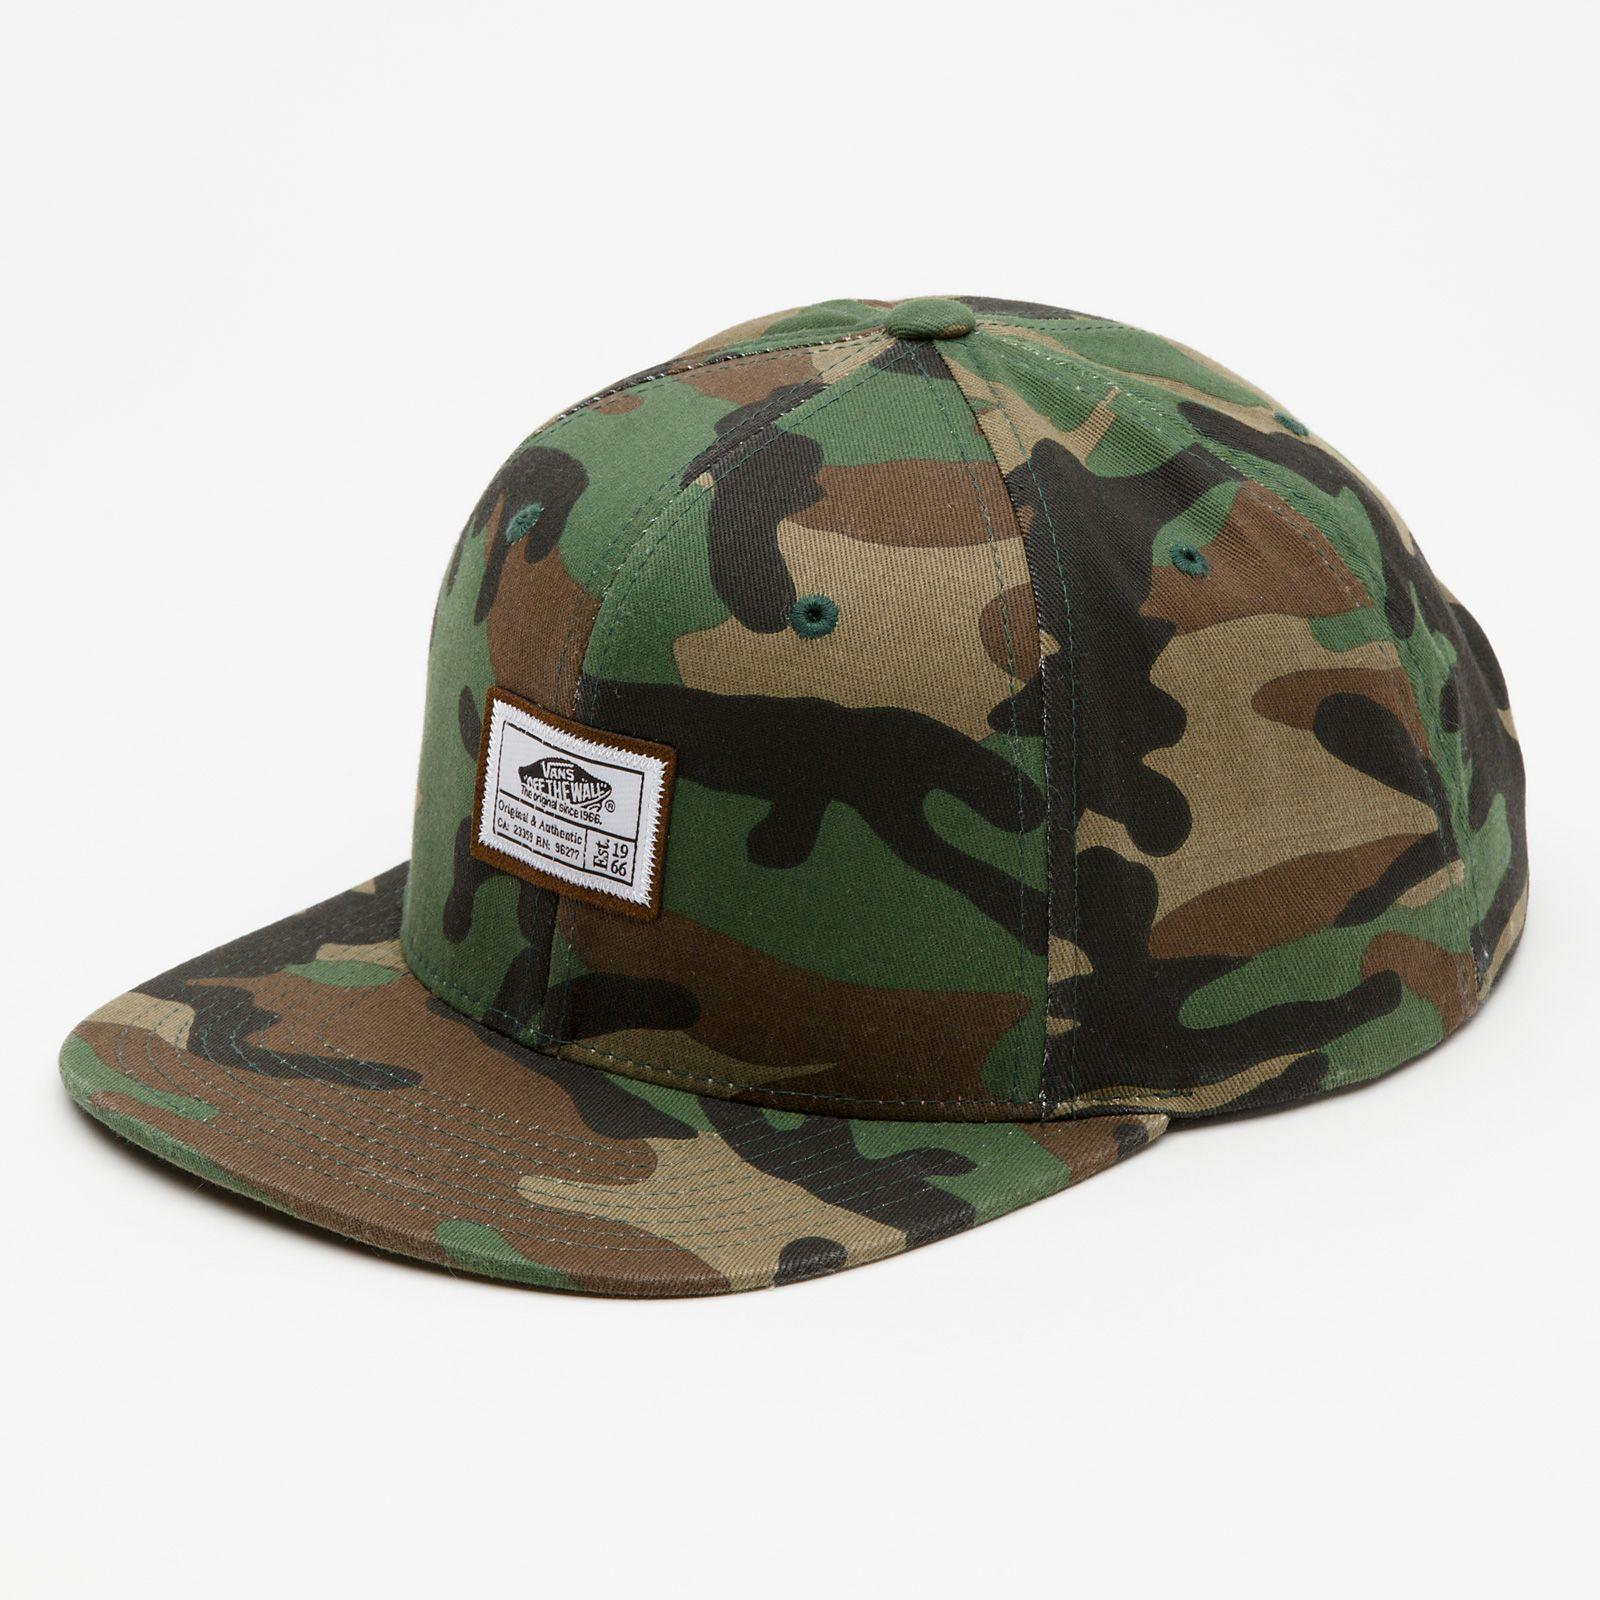 Product  Blackout Starter Cap Camo Hats f24d92e72bb7